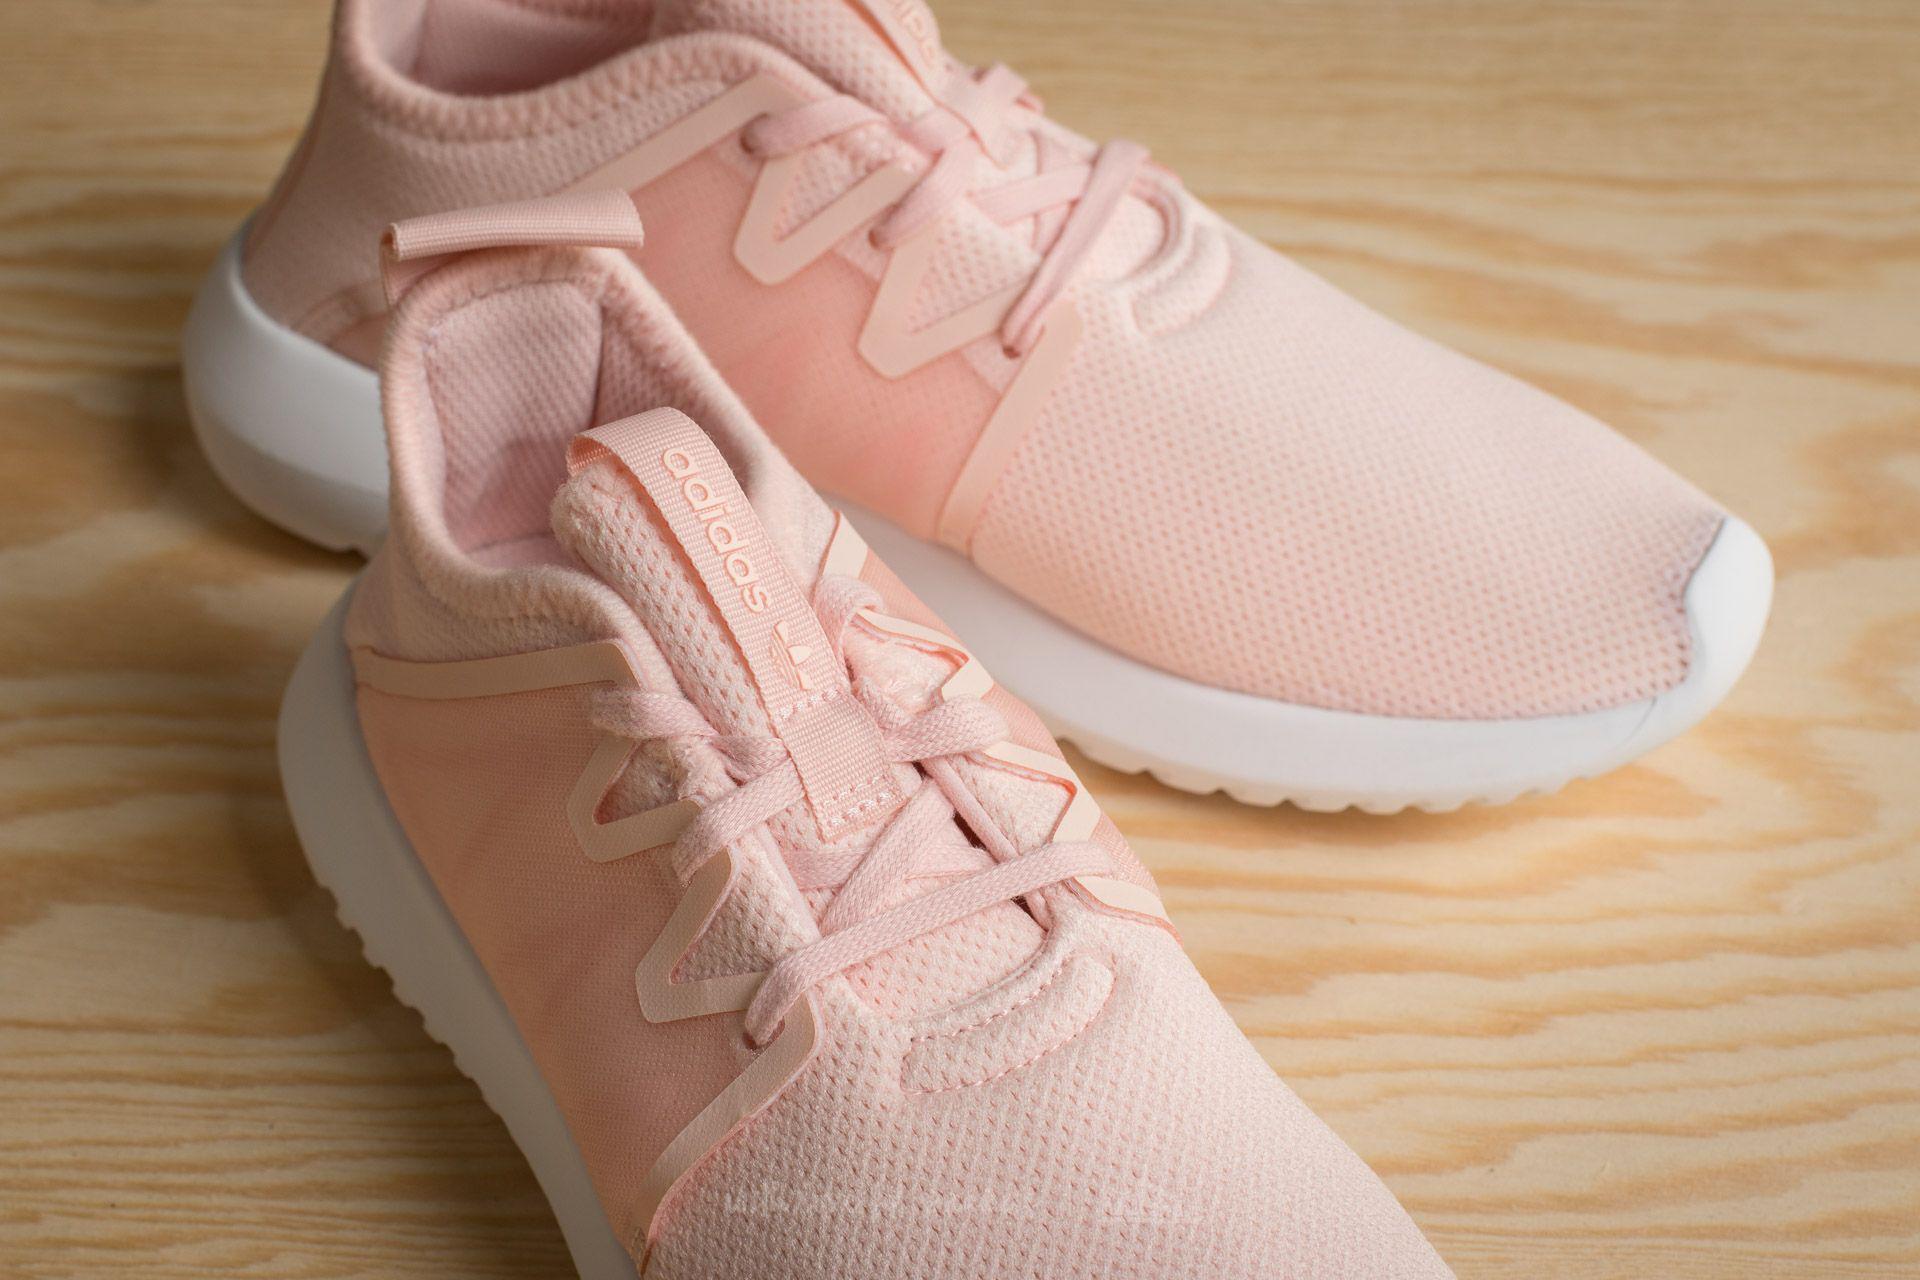 Lyst - Adidas Originals Adidas Tubular Viral 2.0 W Ice Pink  Ice ... 13a3ee1e6a